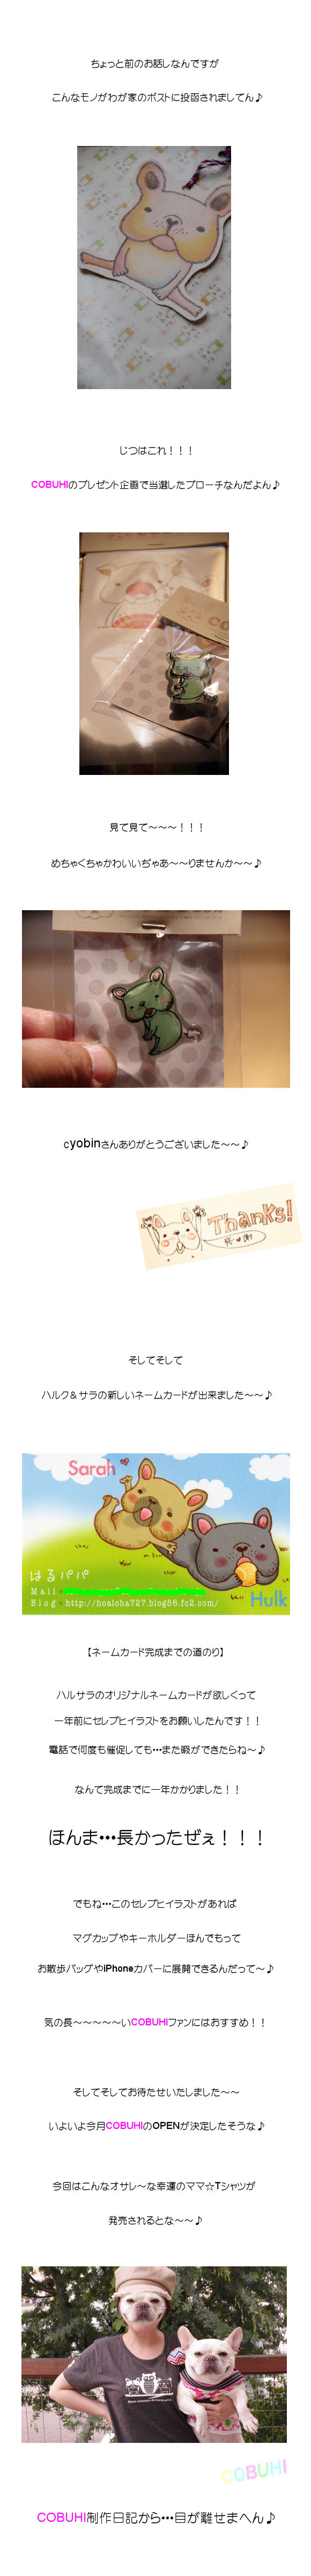 COBUHI☆だぜぇ♪